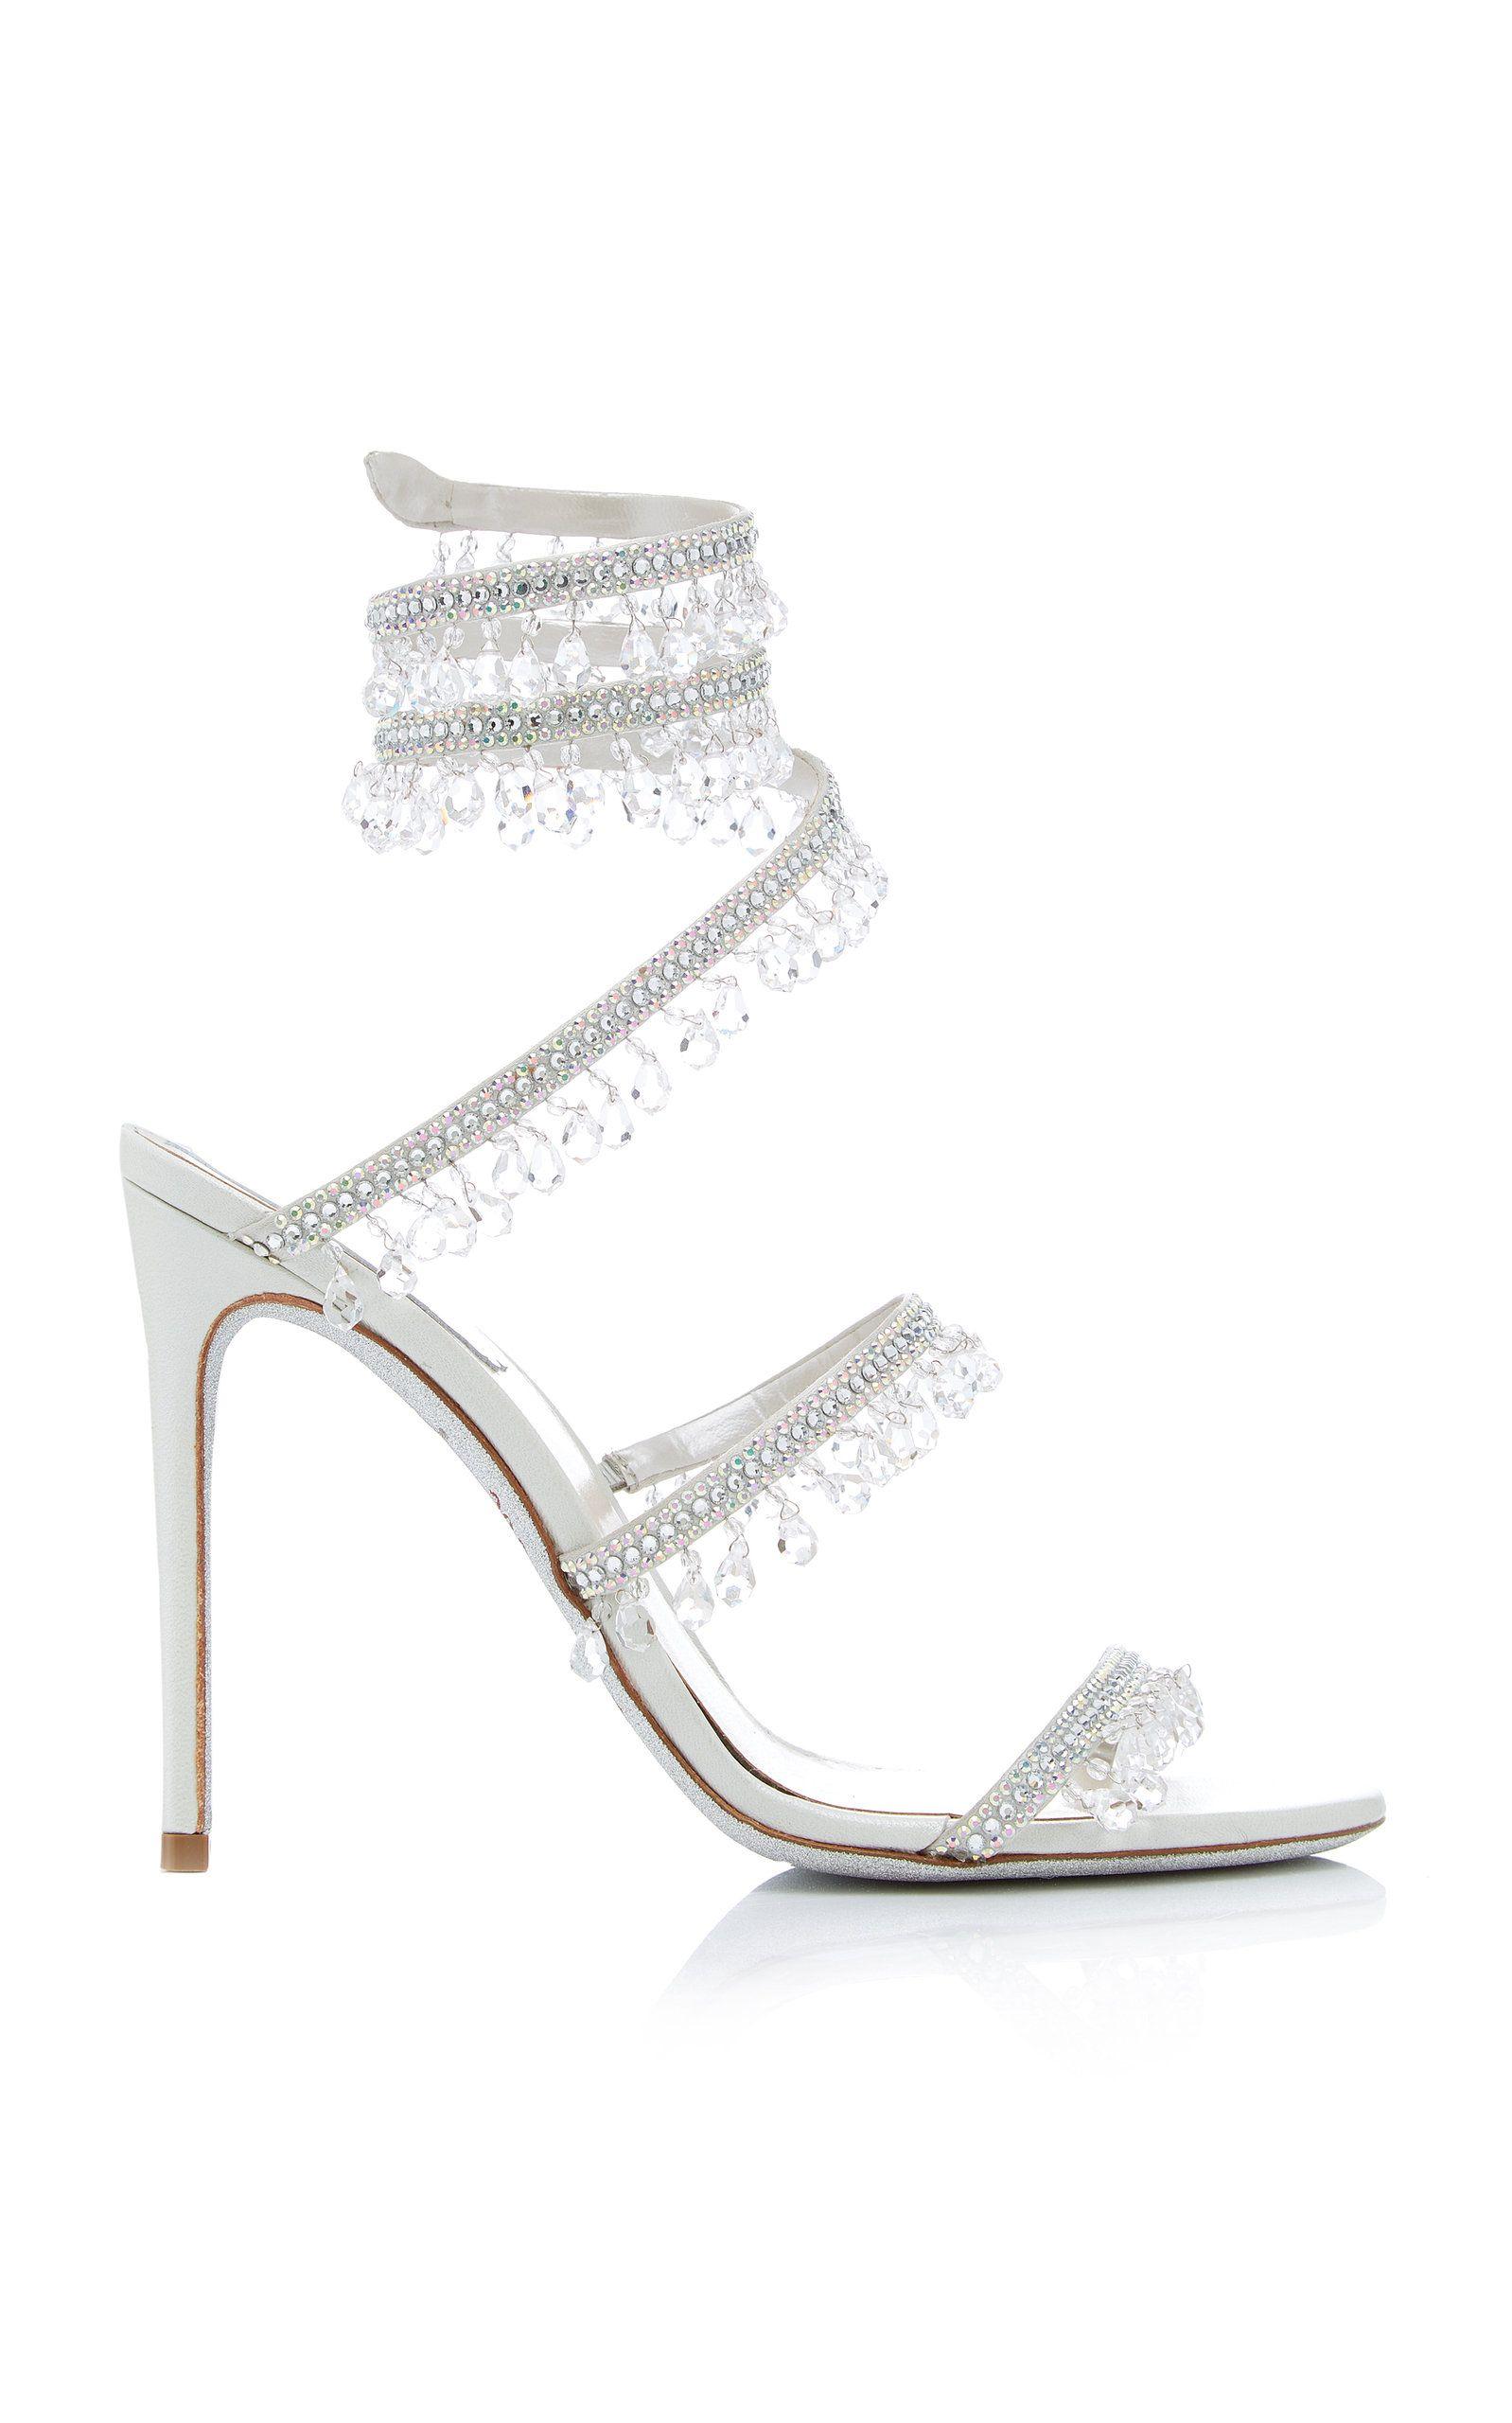 Exclusive Crystal-Embellished Sandal By